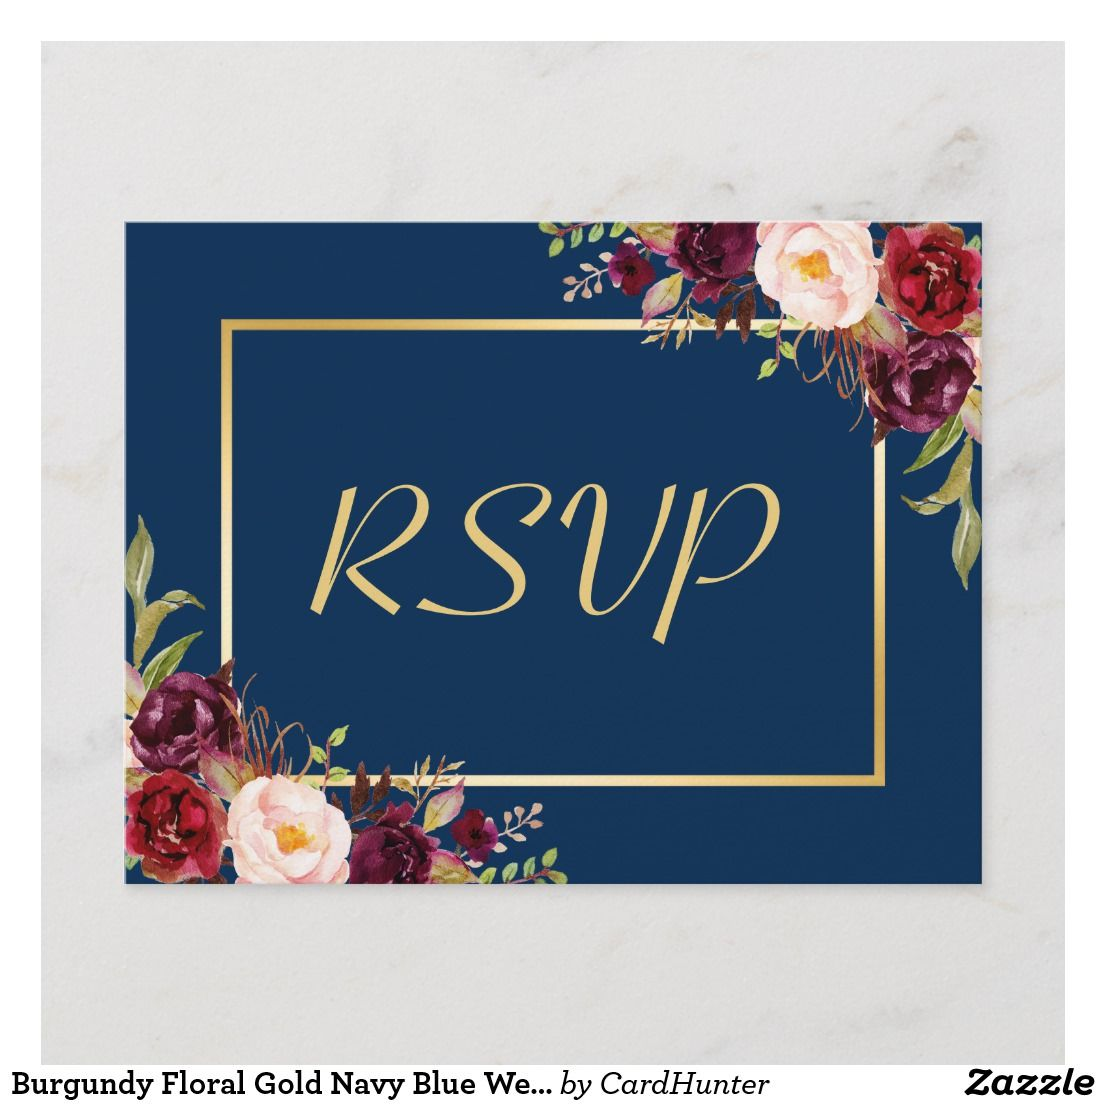 Burgundy Floral Gold Navy Blue Wedding RSVP Reply